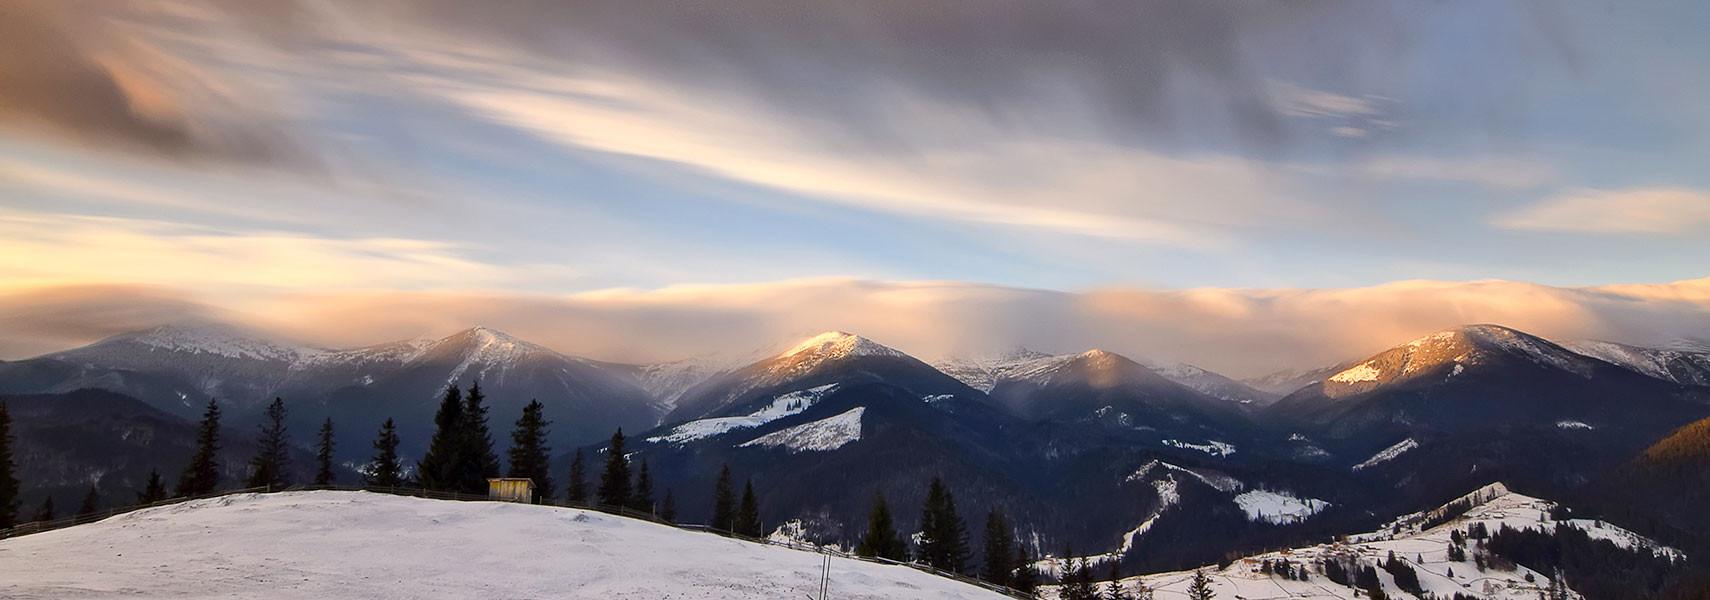 Dzembronia-Carpathian-National-Park.jpg